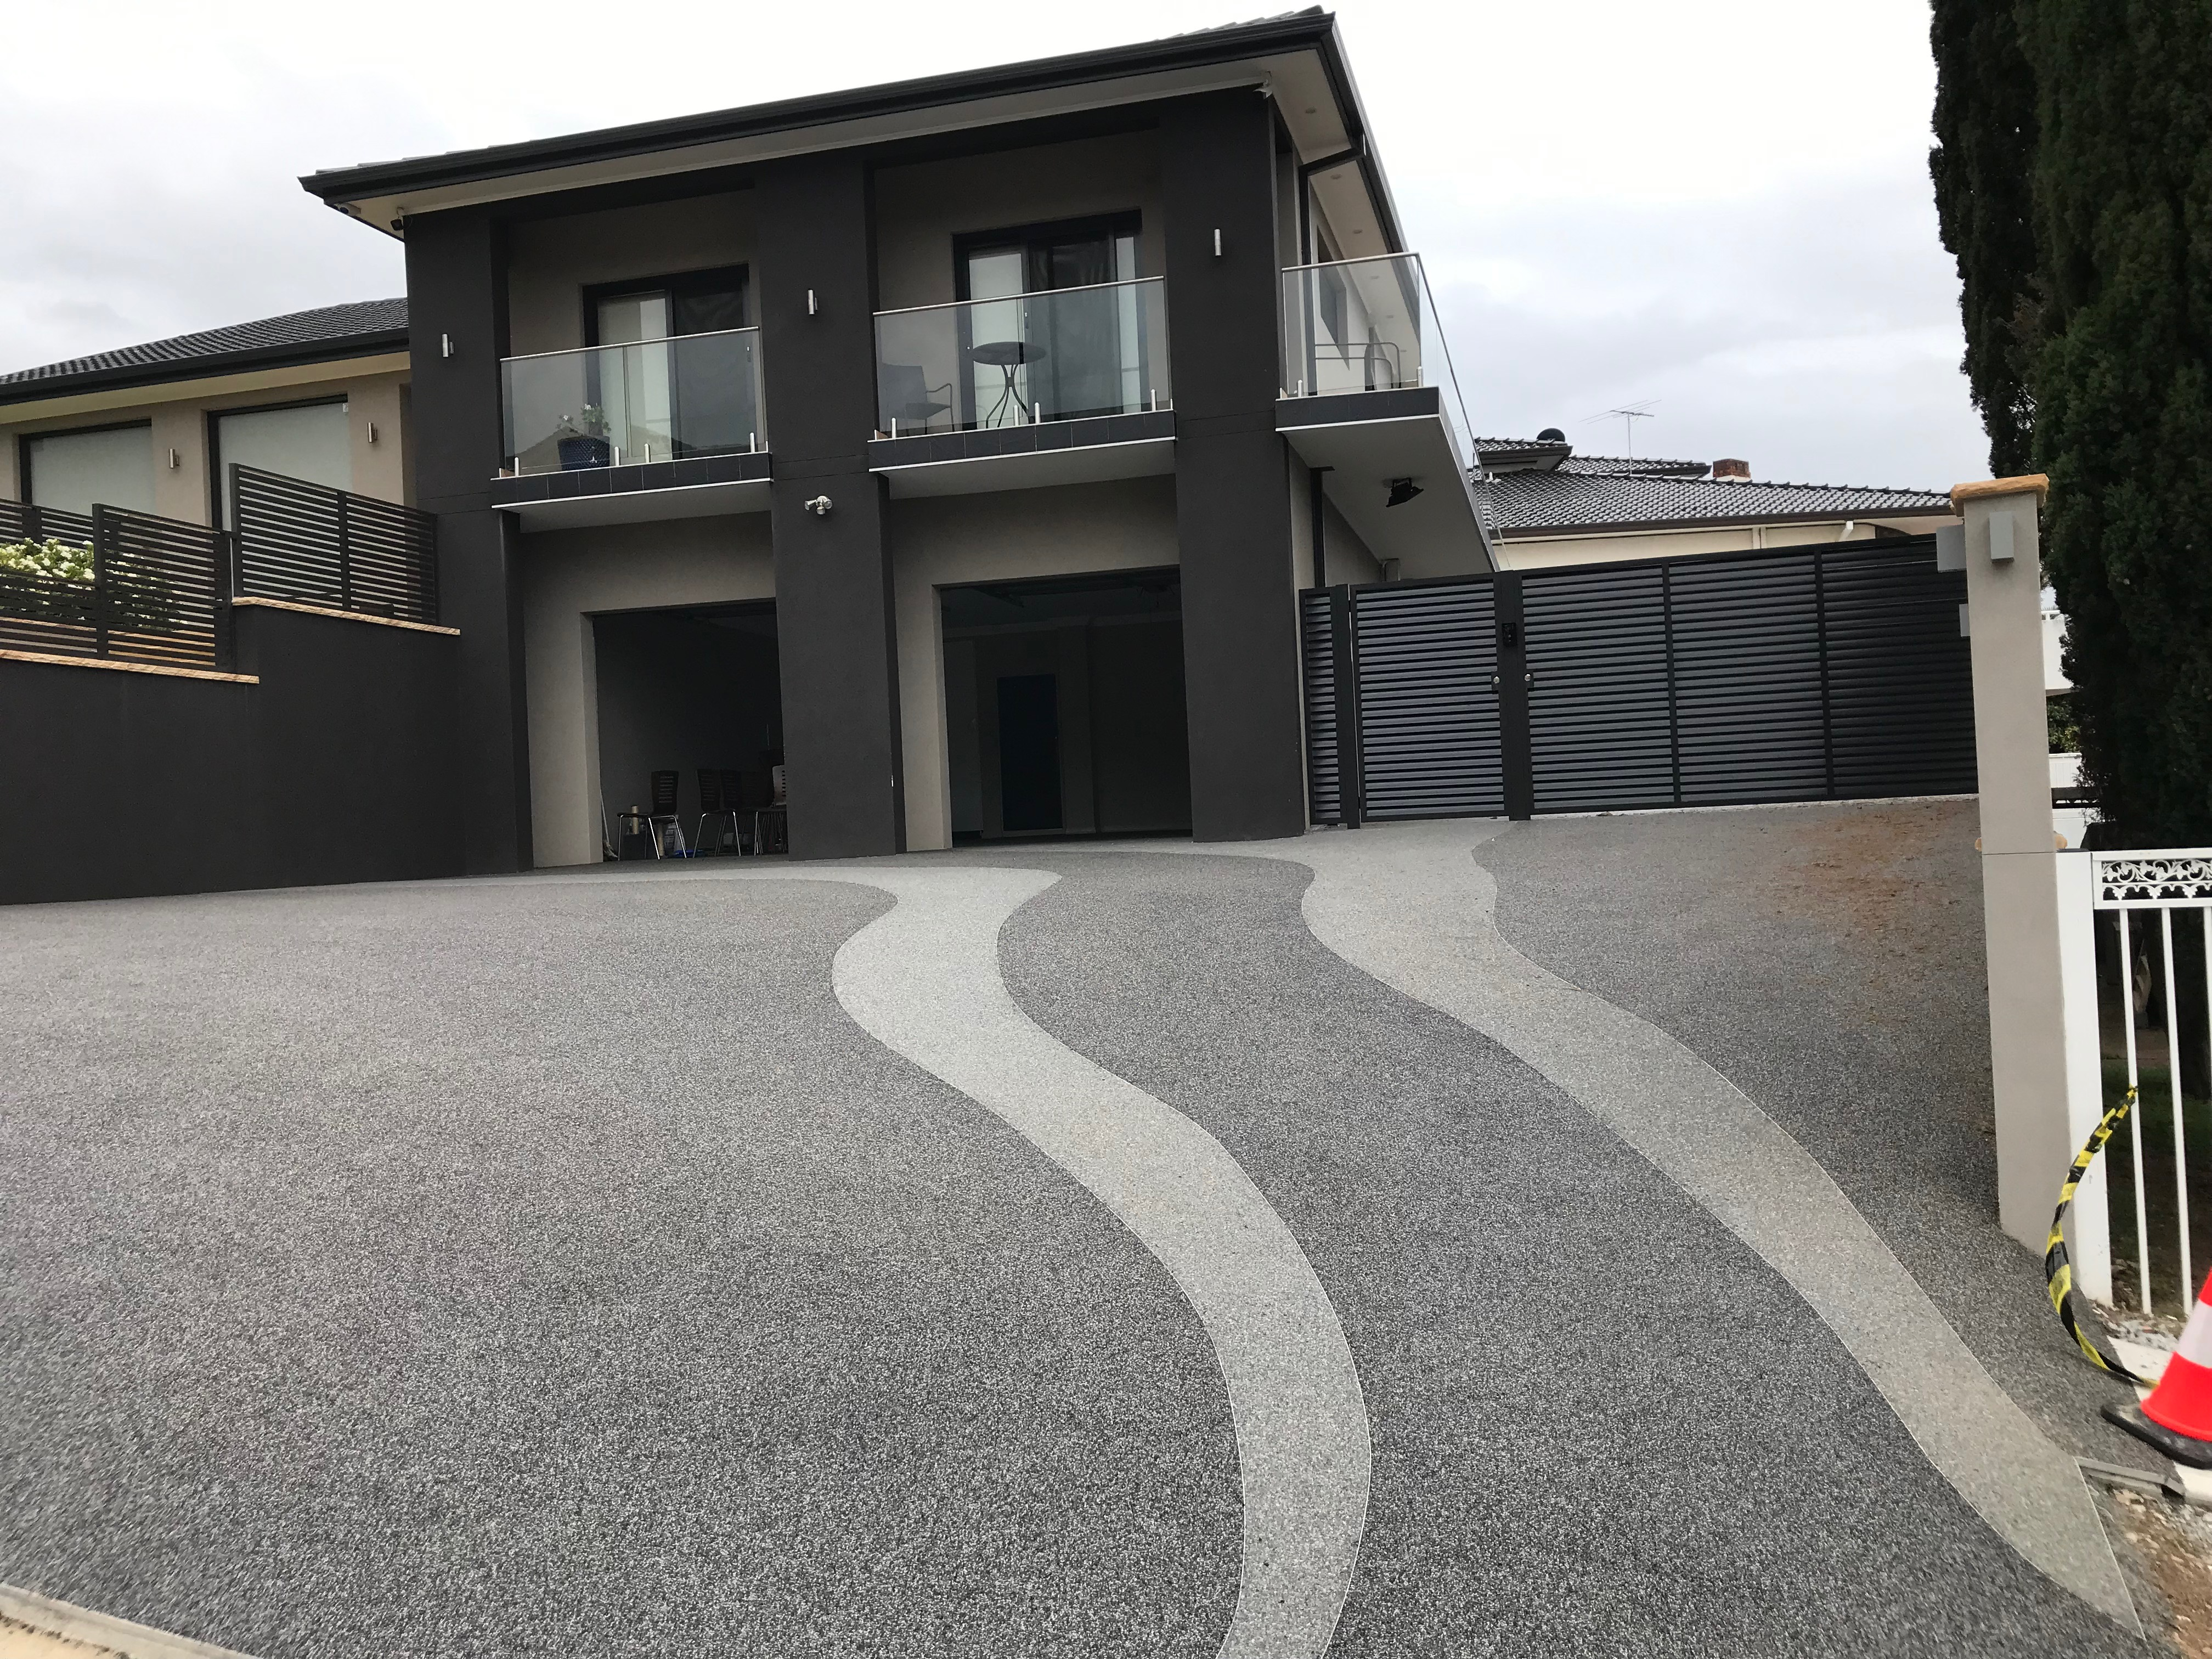 StoneSet Overlays a New Plain Driveway